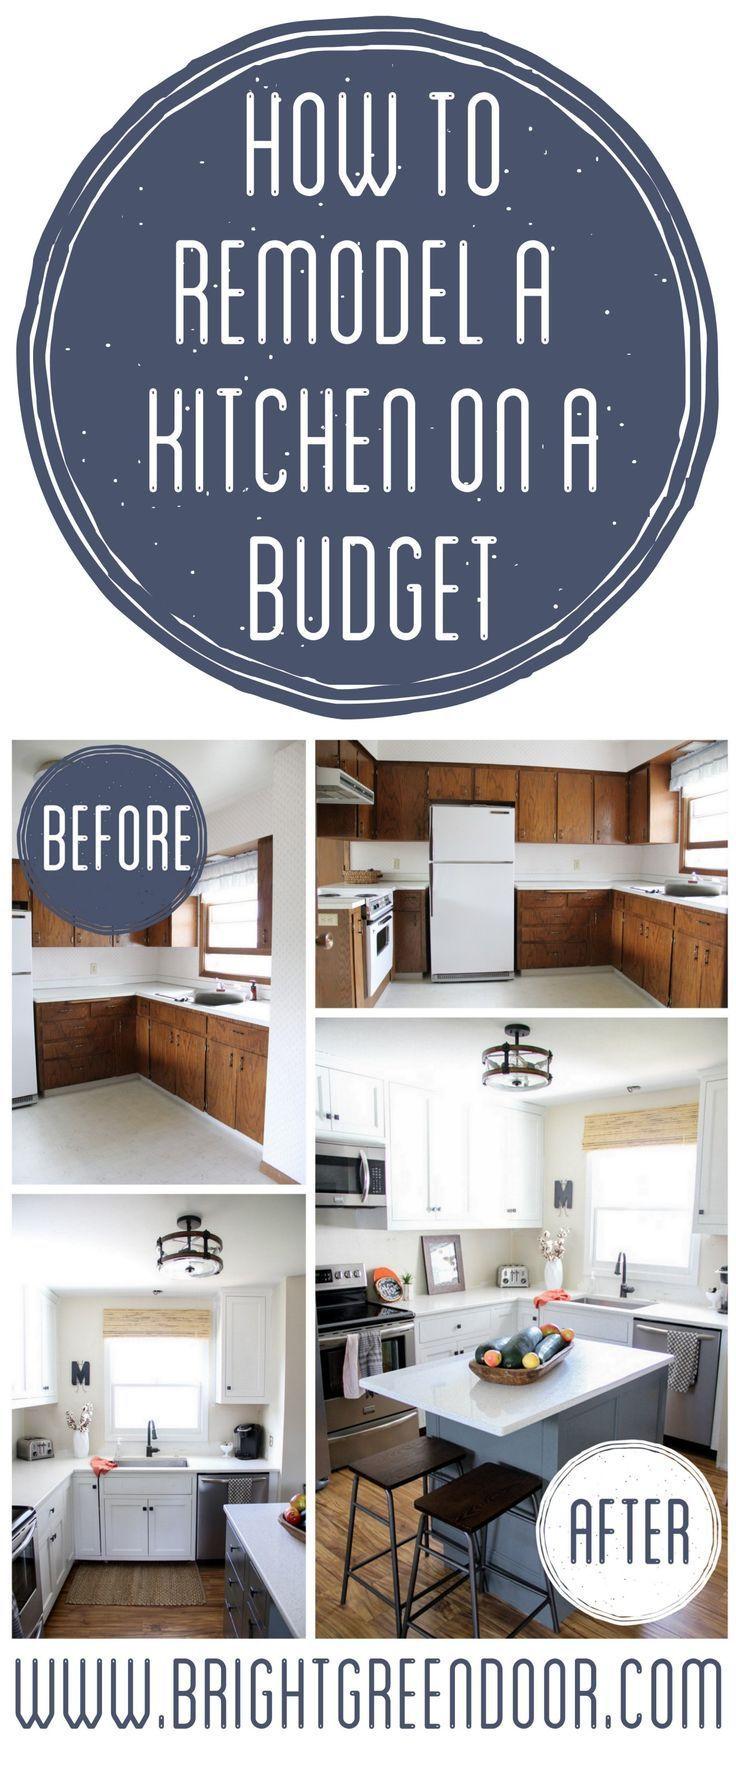 Home Design Ideas: Home Decorating Ideas On a Budget Home Decorating ...